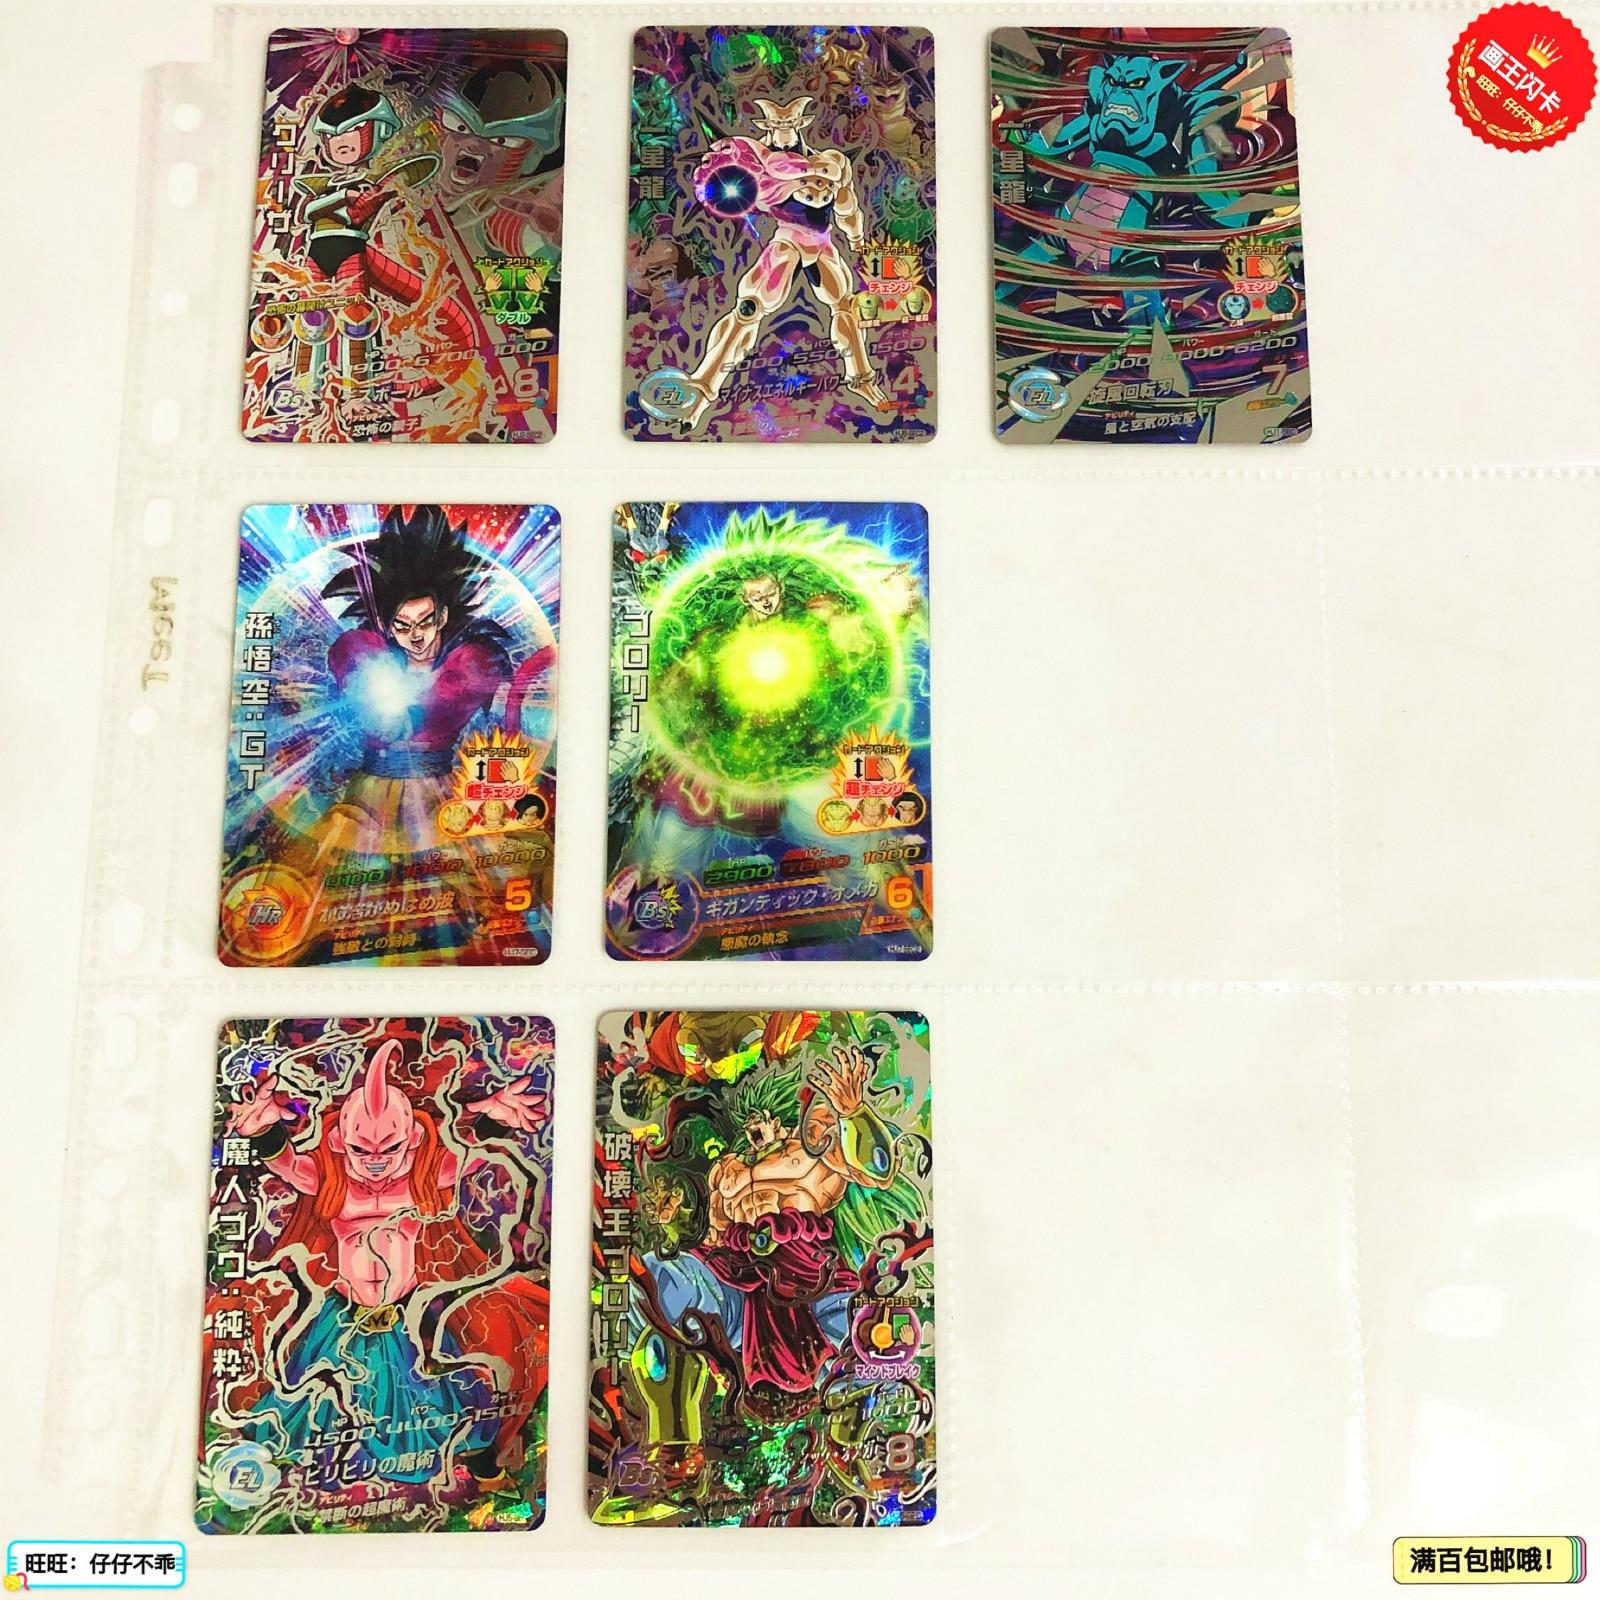 Japan Original Dragon Ball Hero Card 4 Stars SEC 3D Goku Toys Hobbies Collectibles Game Collection Anime Cards